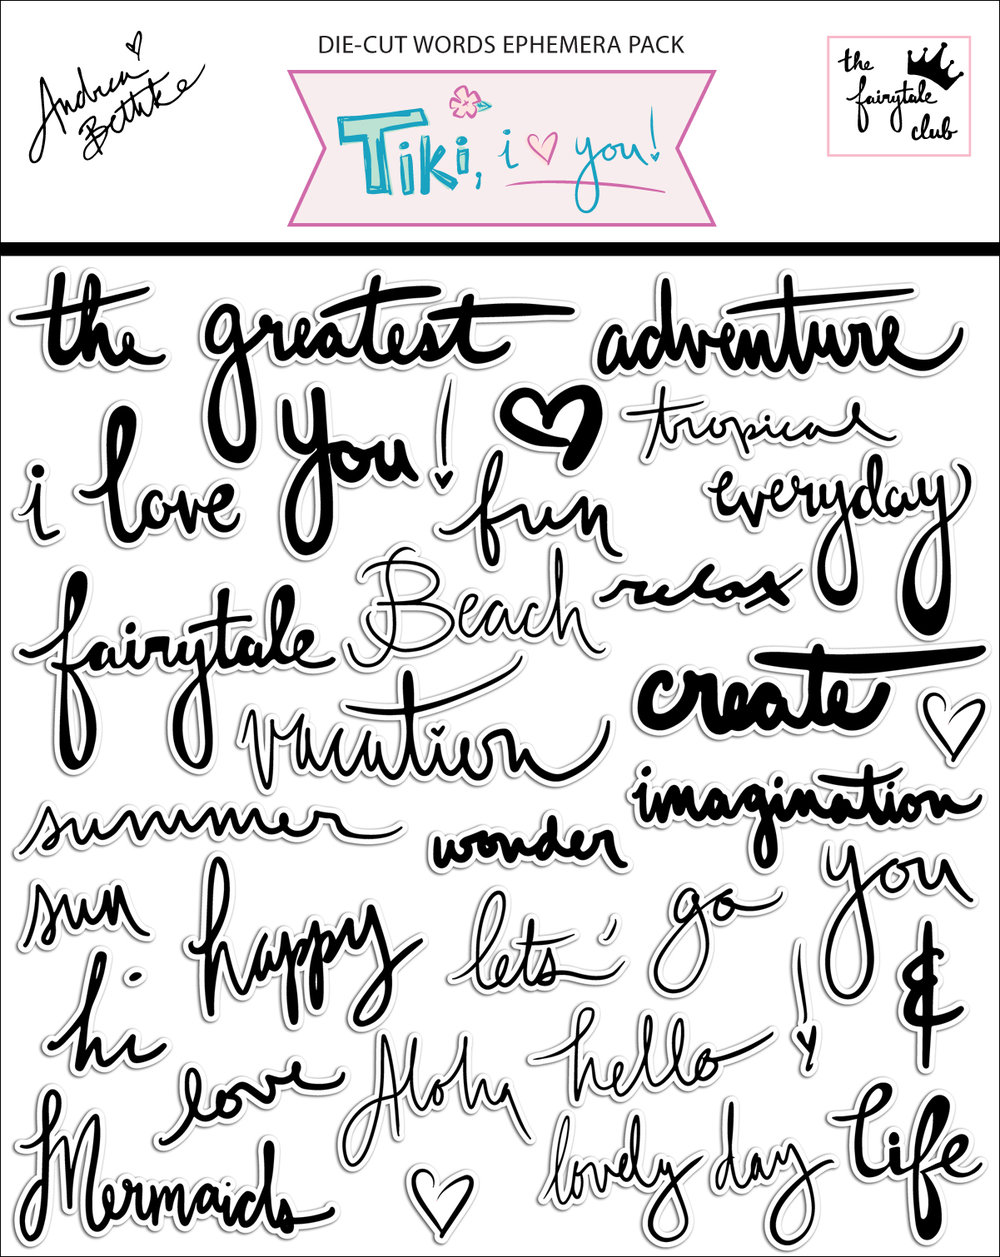 Tiki, I Love You -Words Ephemera Pack with packaging.jpg